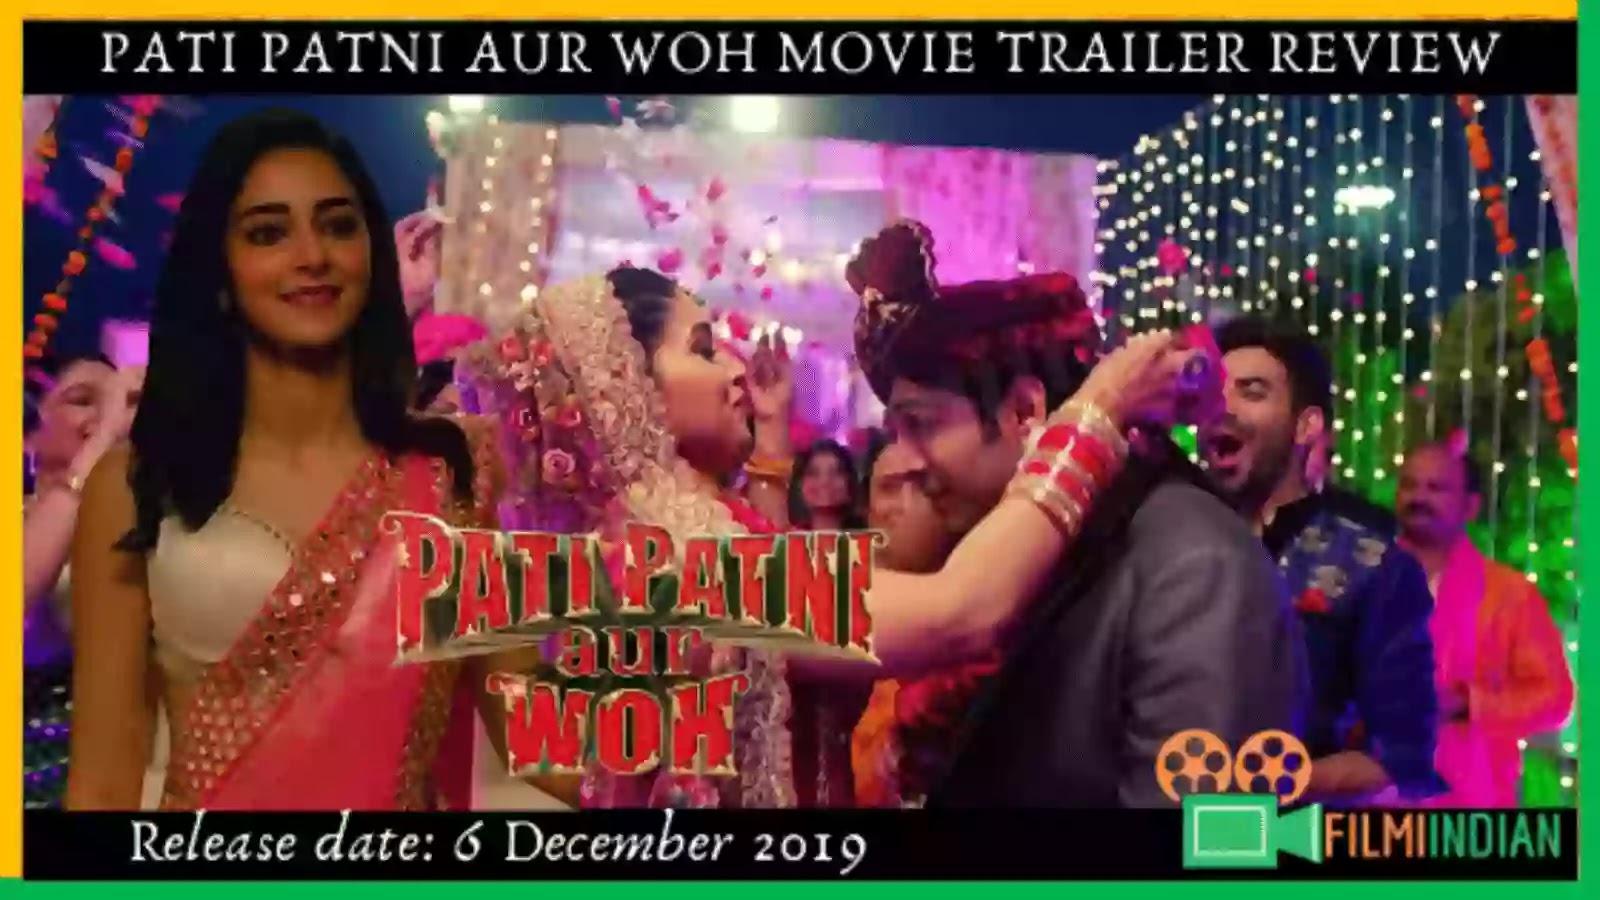 Pati Patni Aur Woh : (2019) Movie Trailer : Best And Honest Review